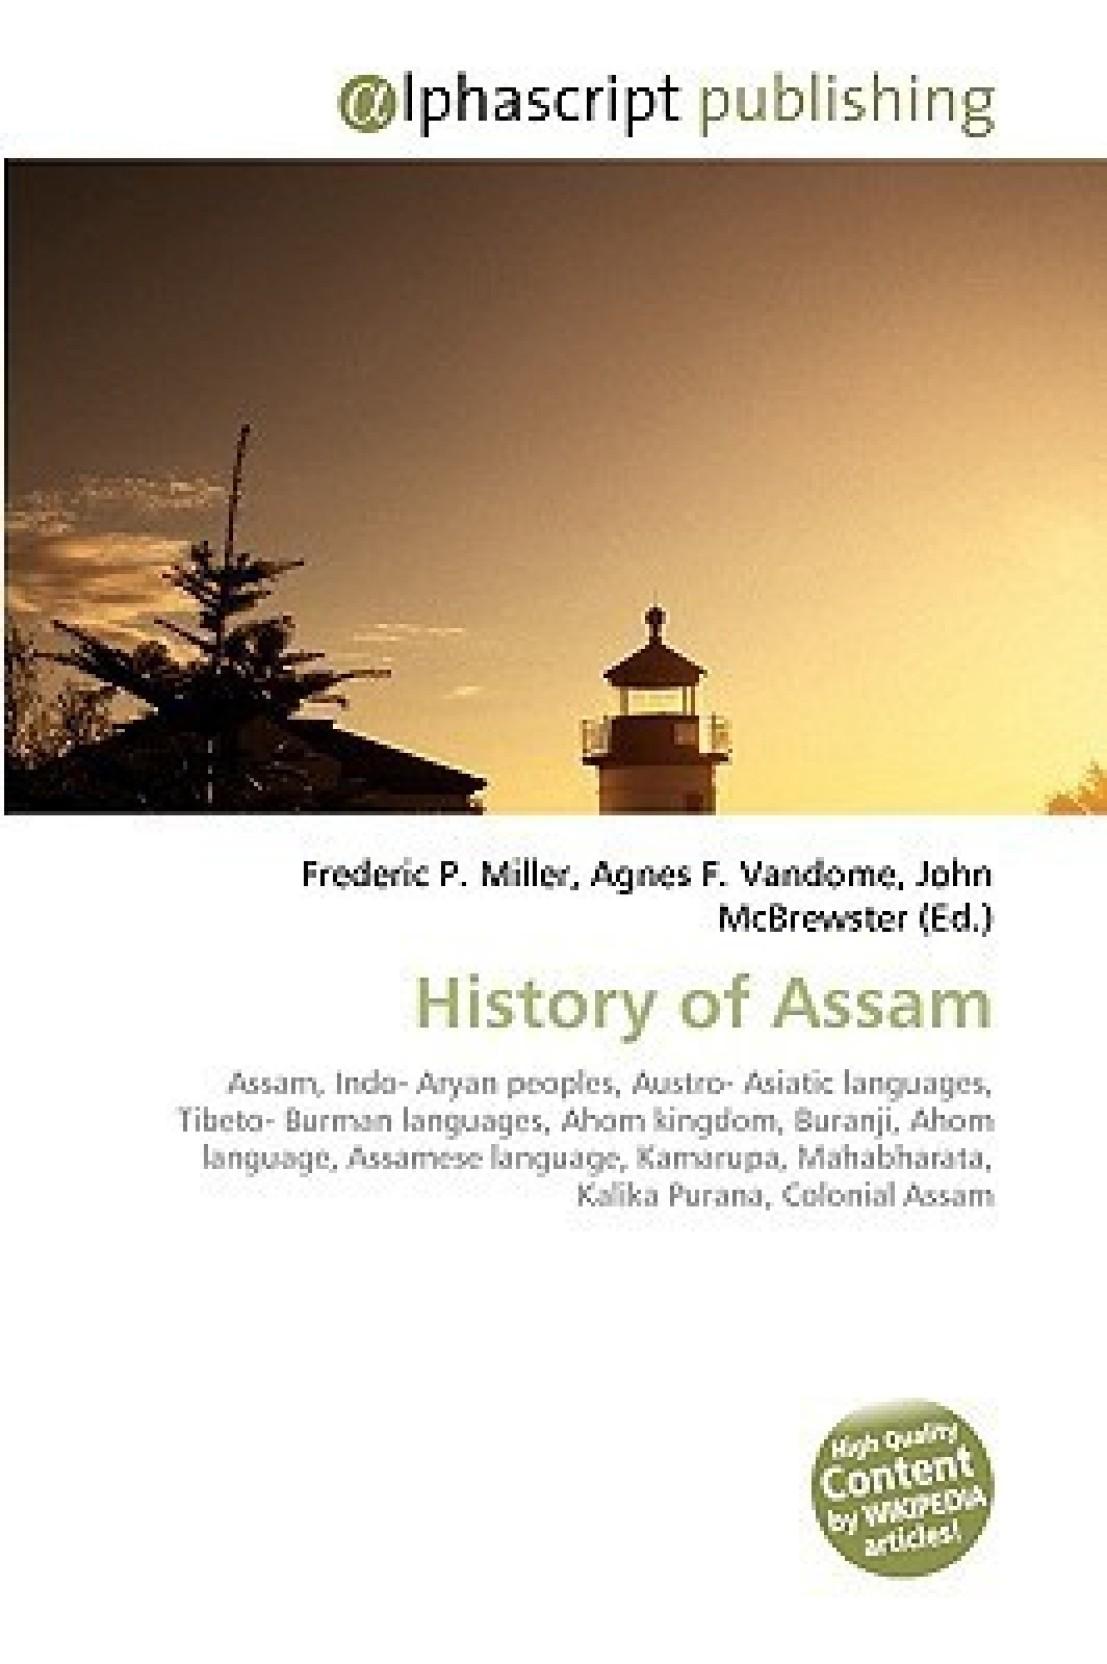 History of Assam: Assam, Indo- Aryan peoples, Austro- Asiatic